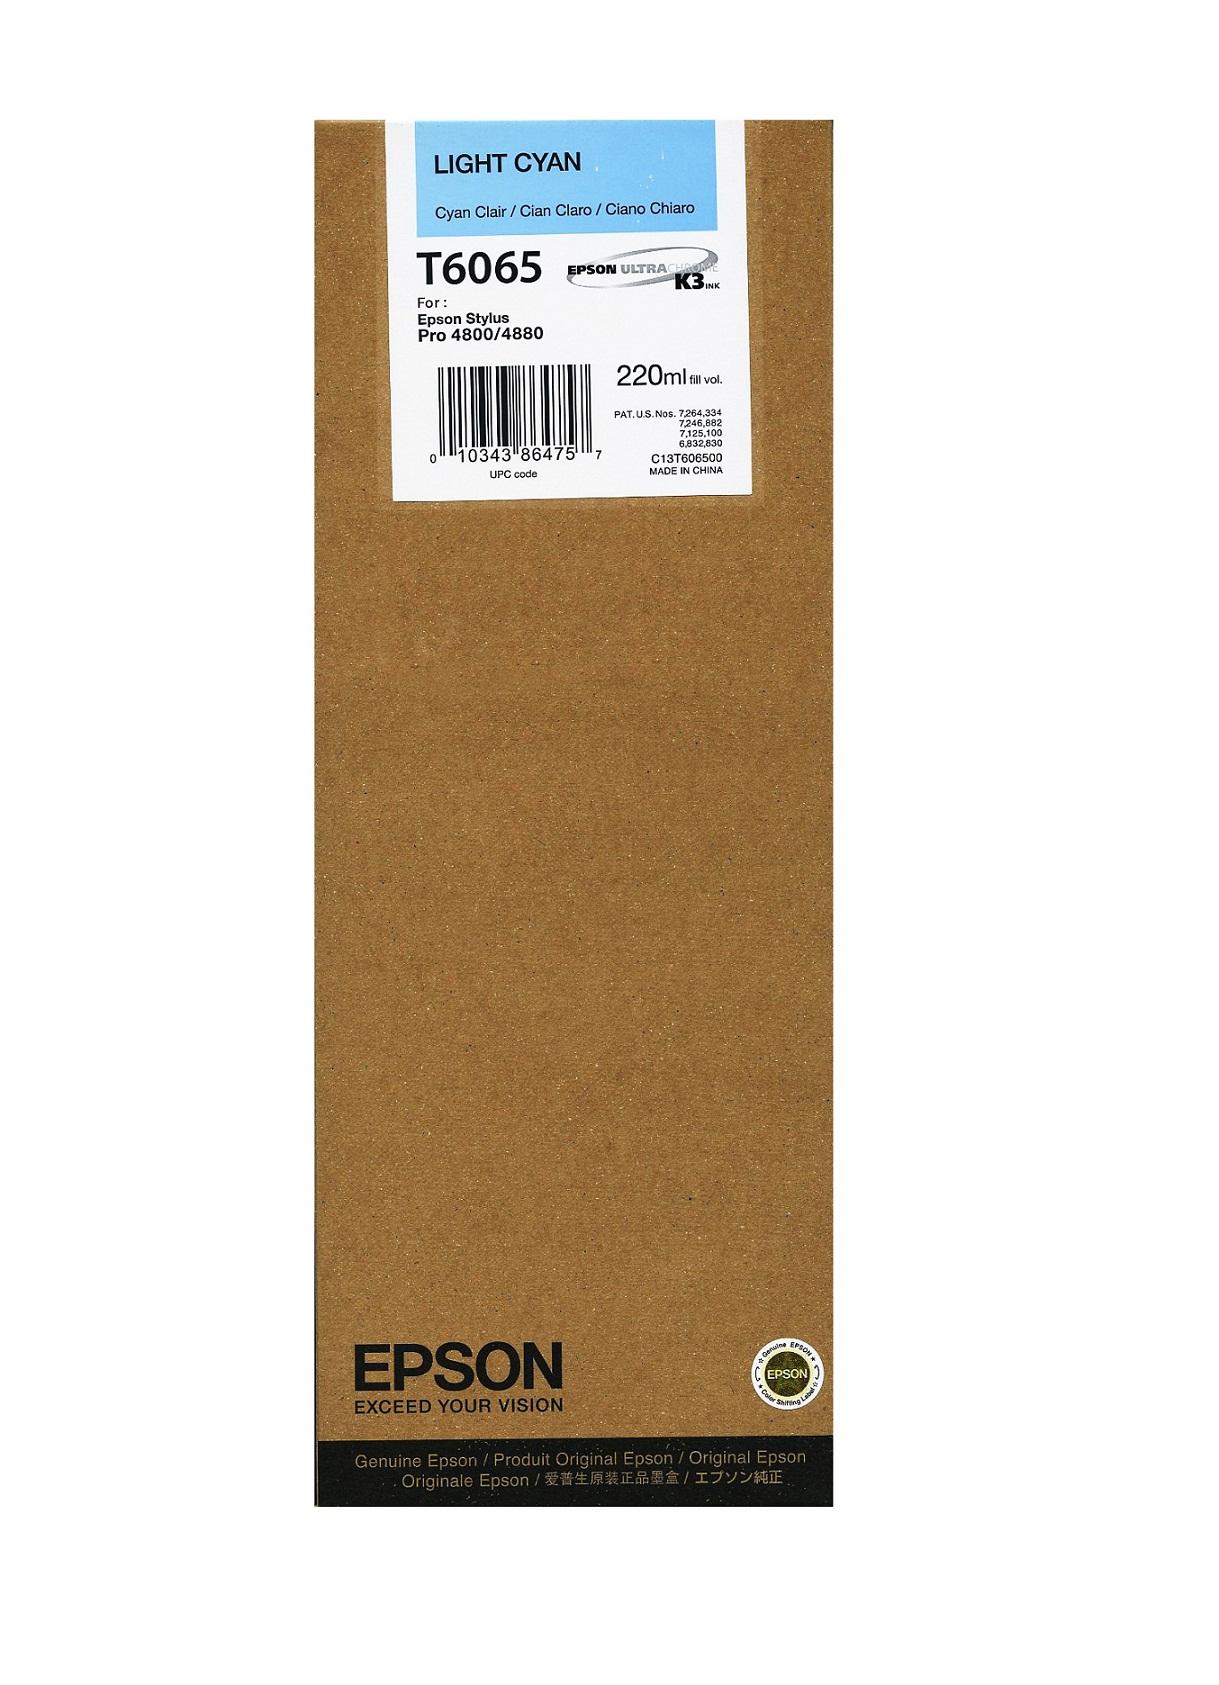 Epson T606 Light Cyan 220 ml